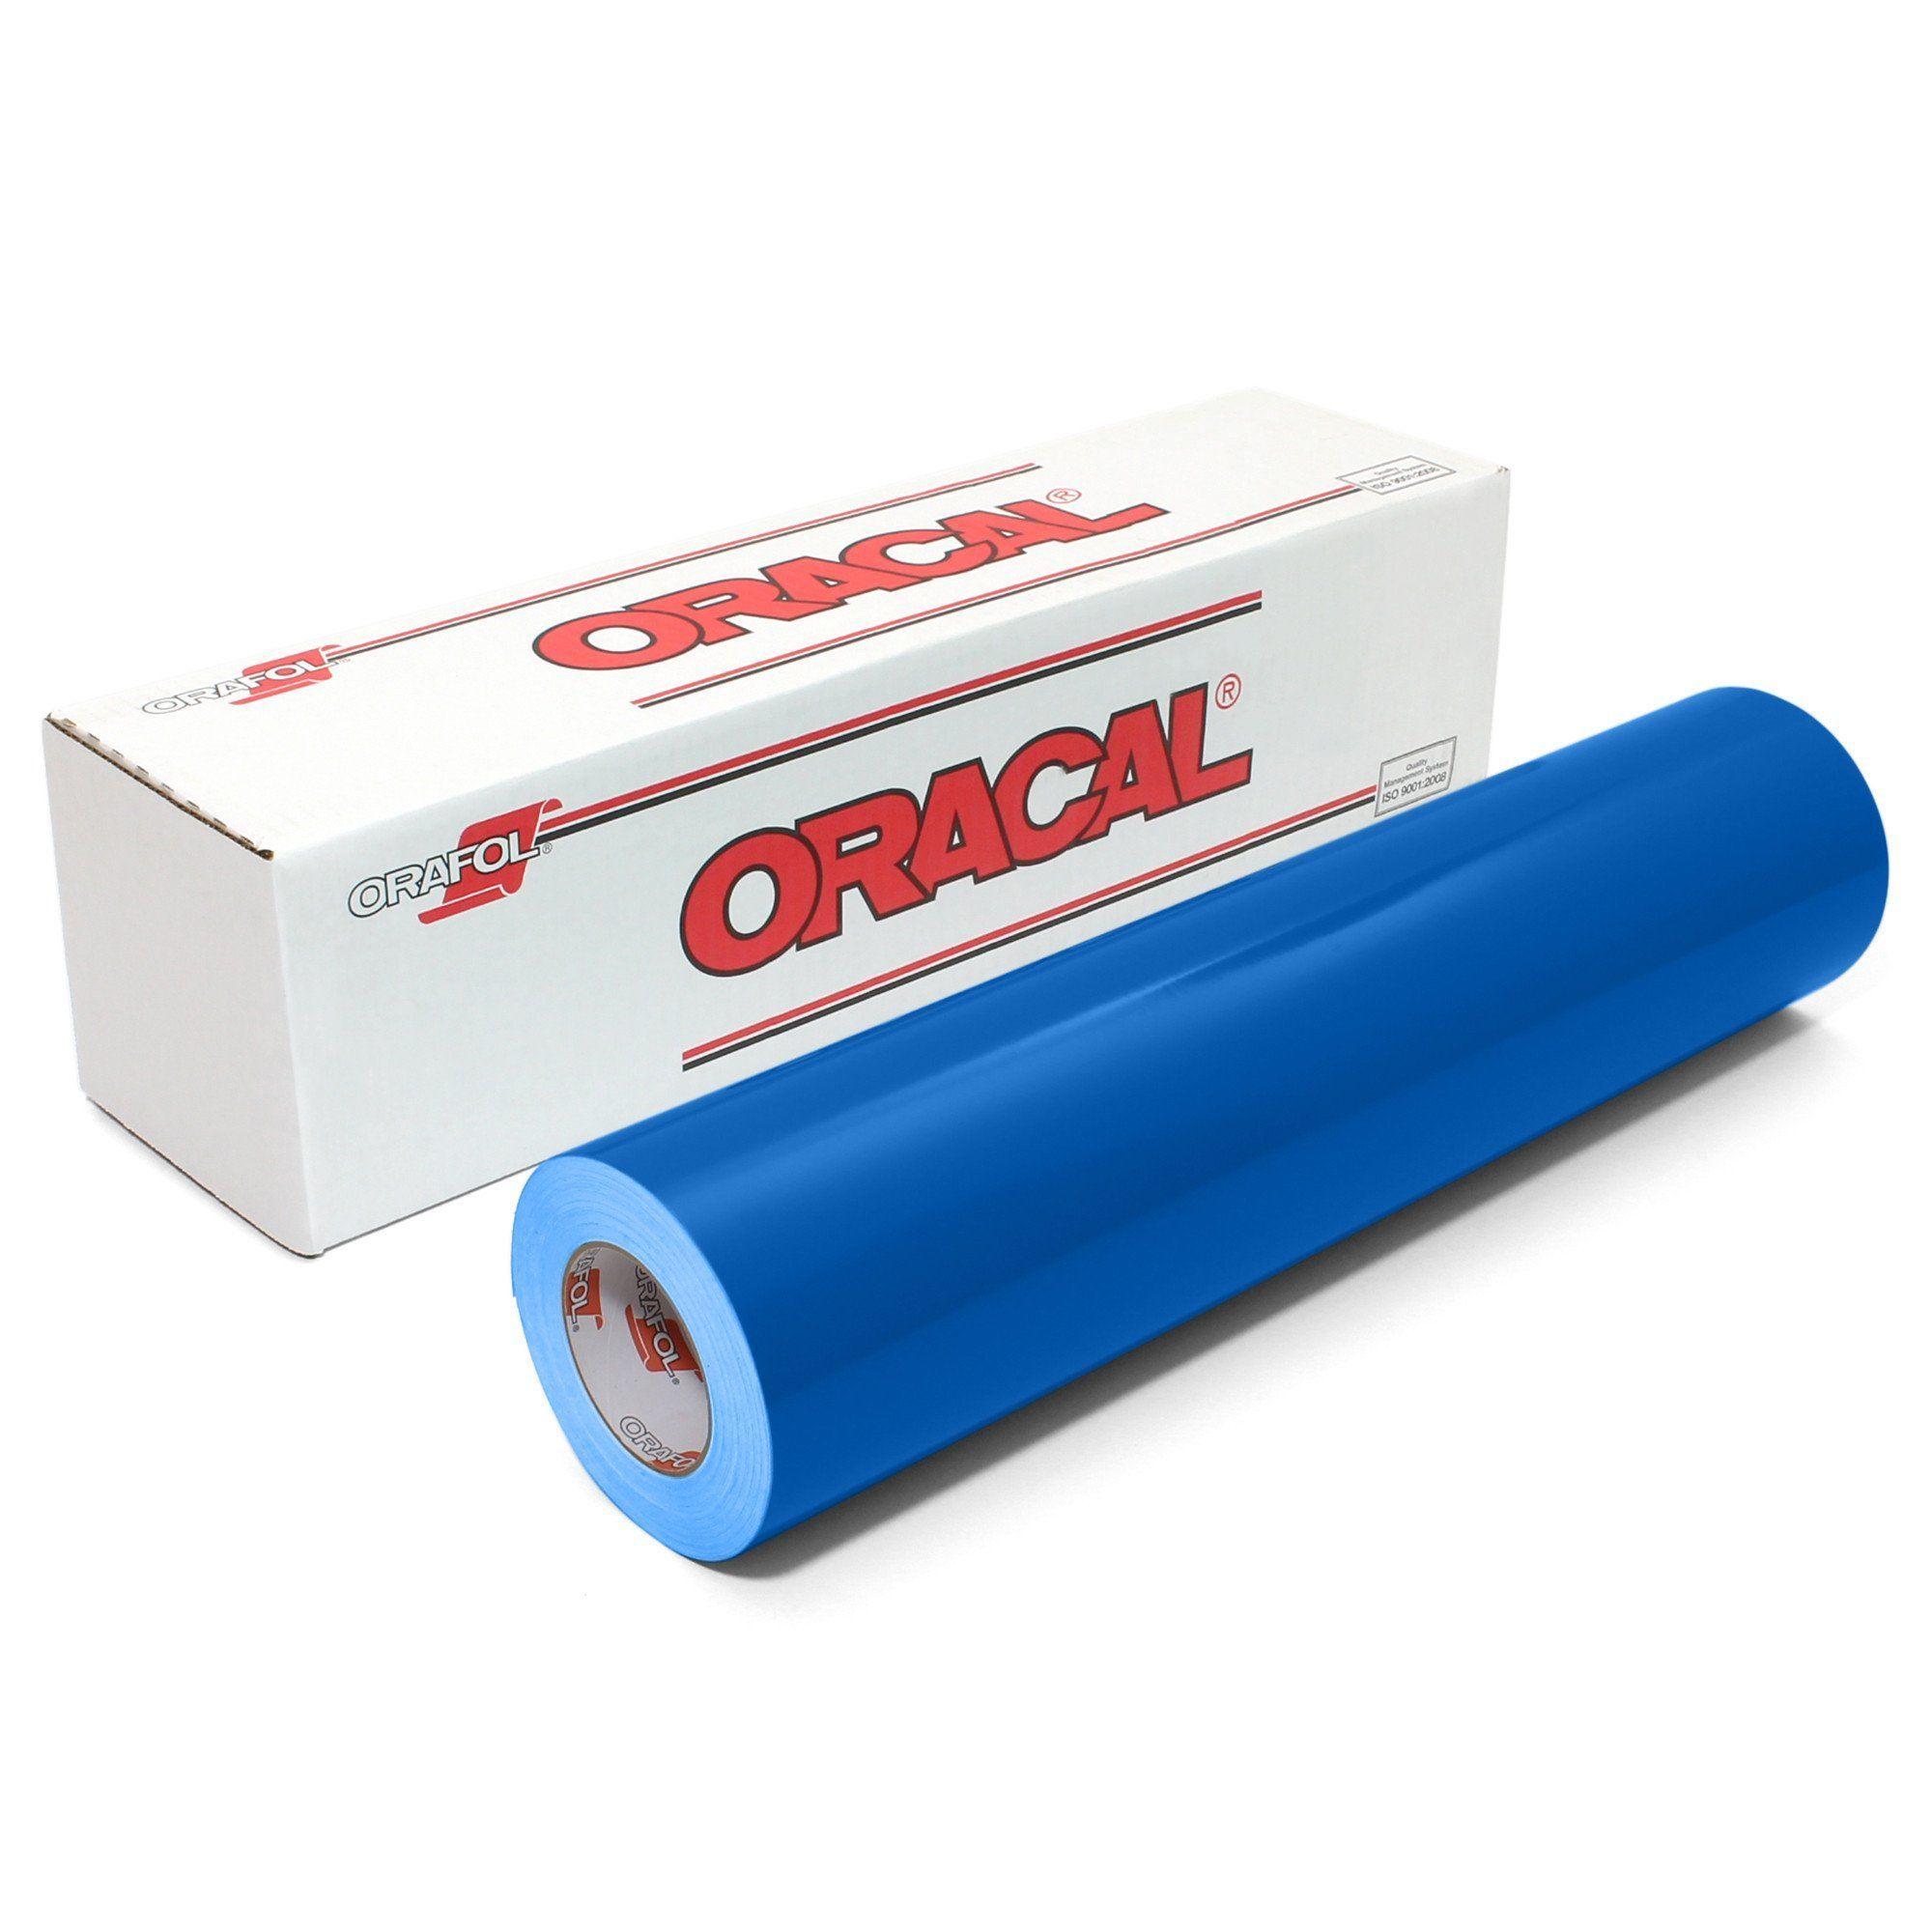 Oracal 651 Glossy 12 Vinyl Rolls Oracal Adhesive Vinyl